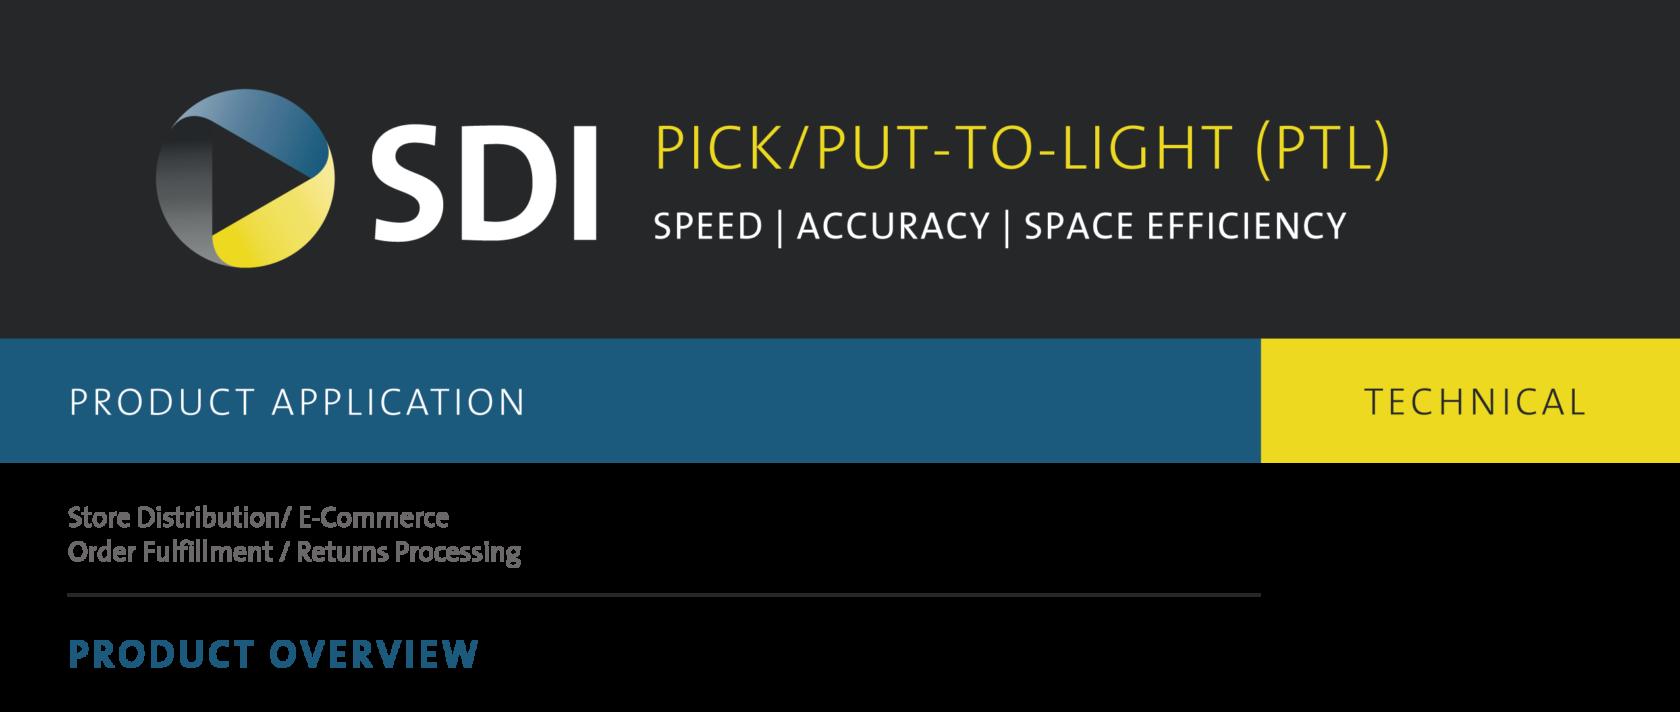 PTL-08